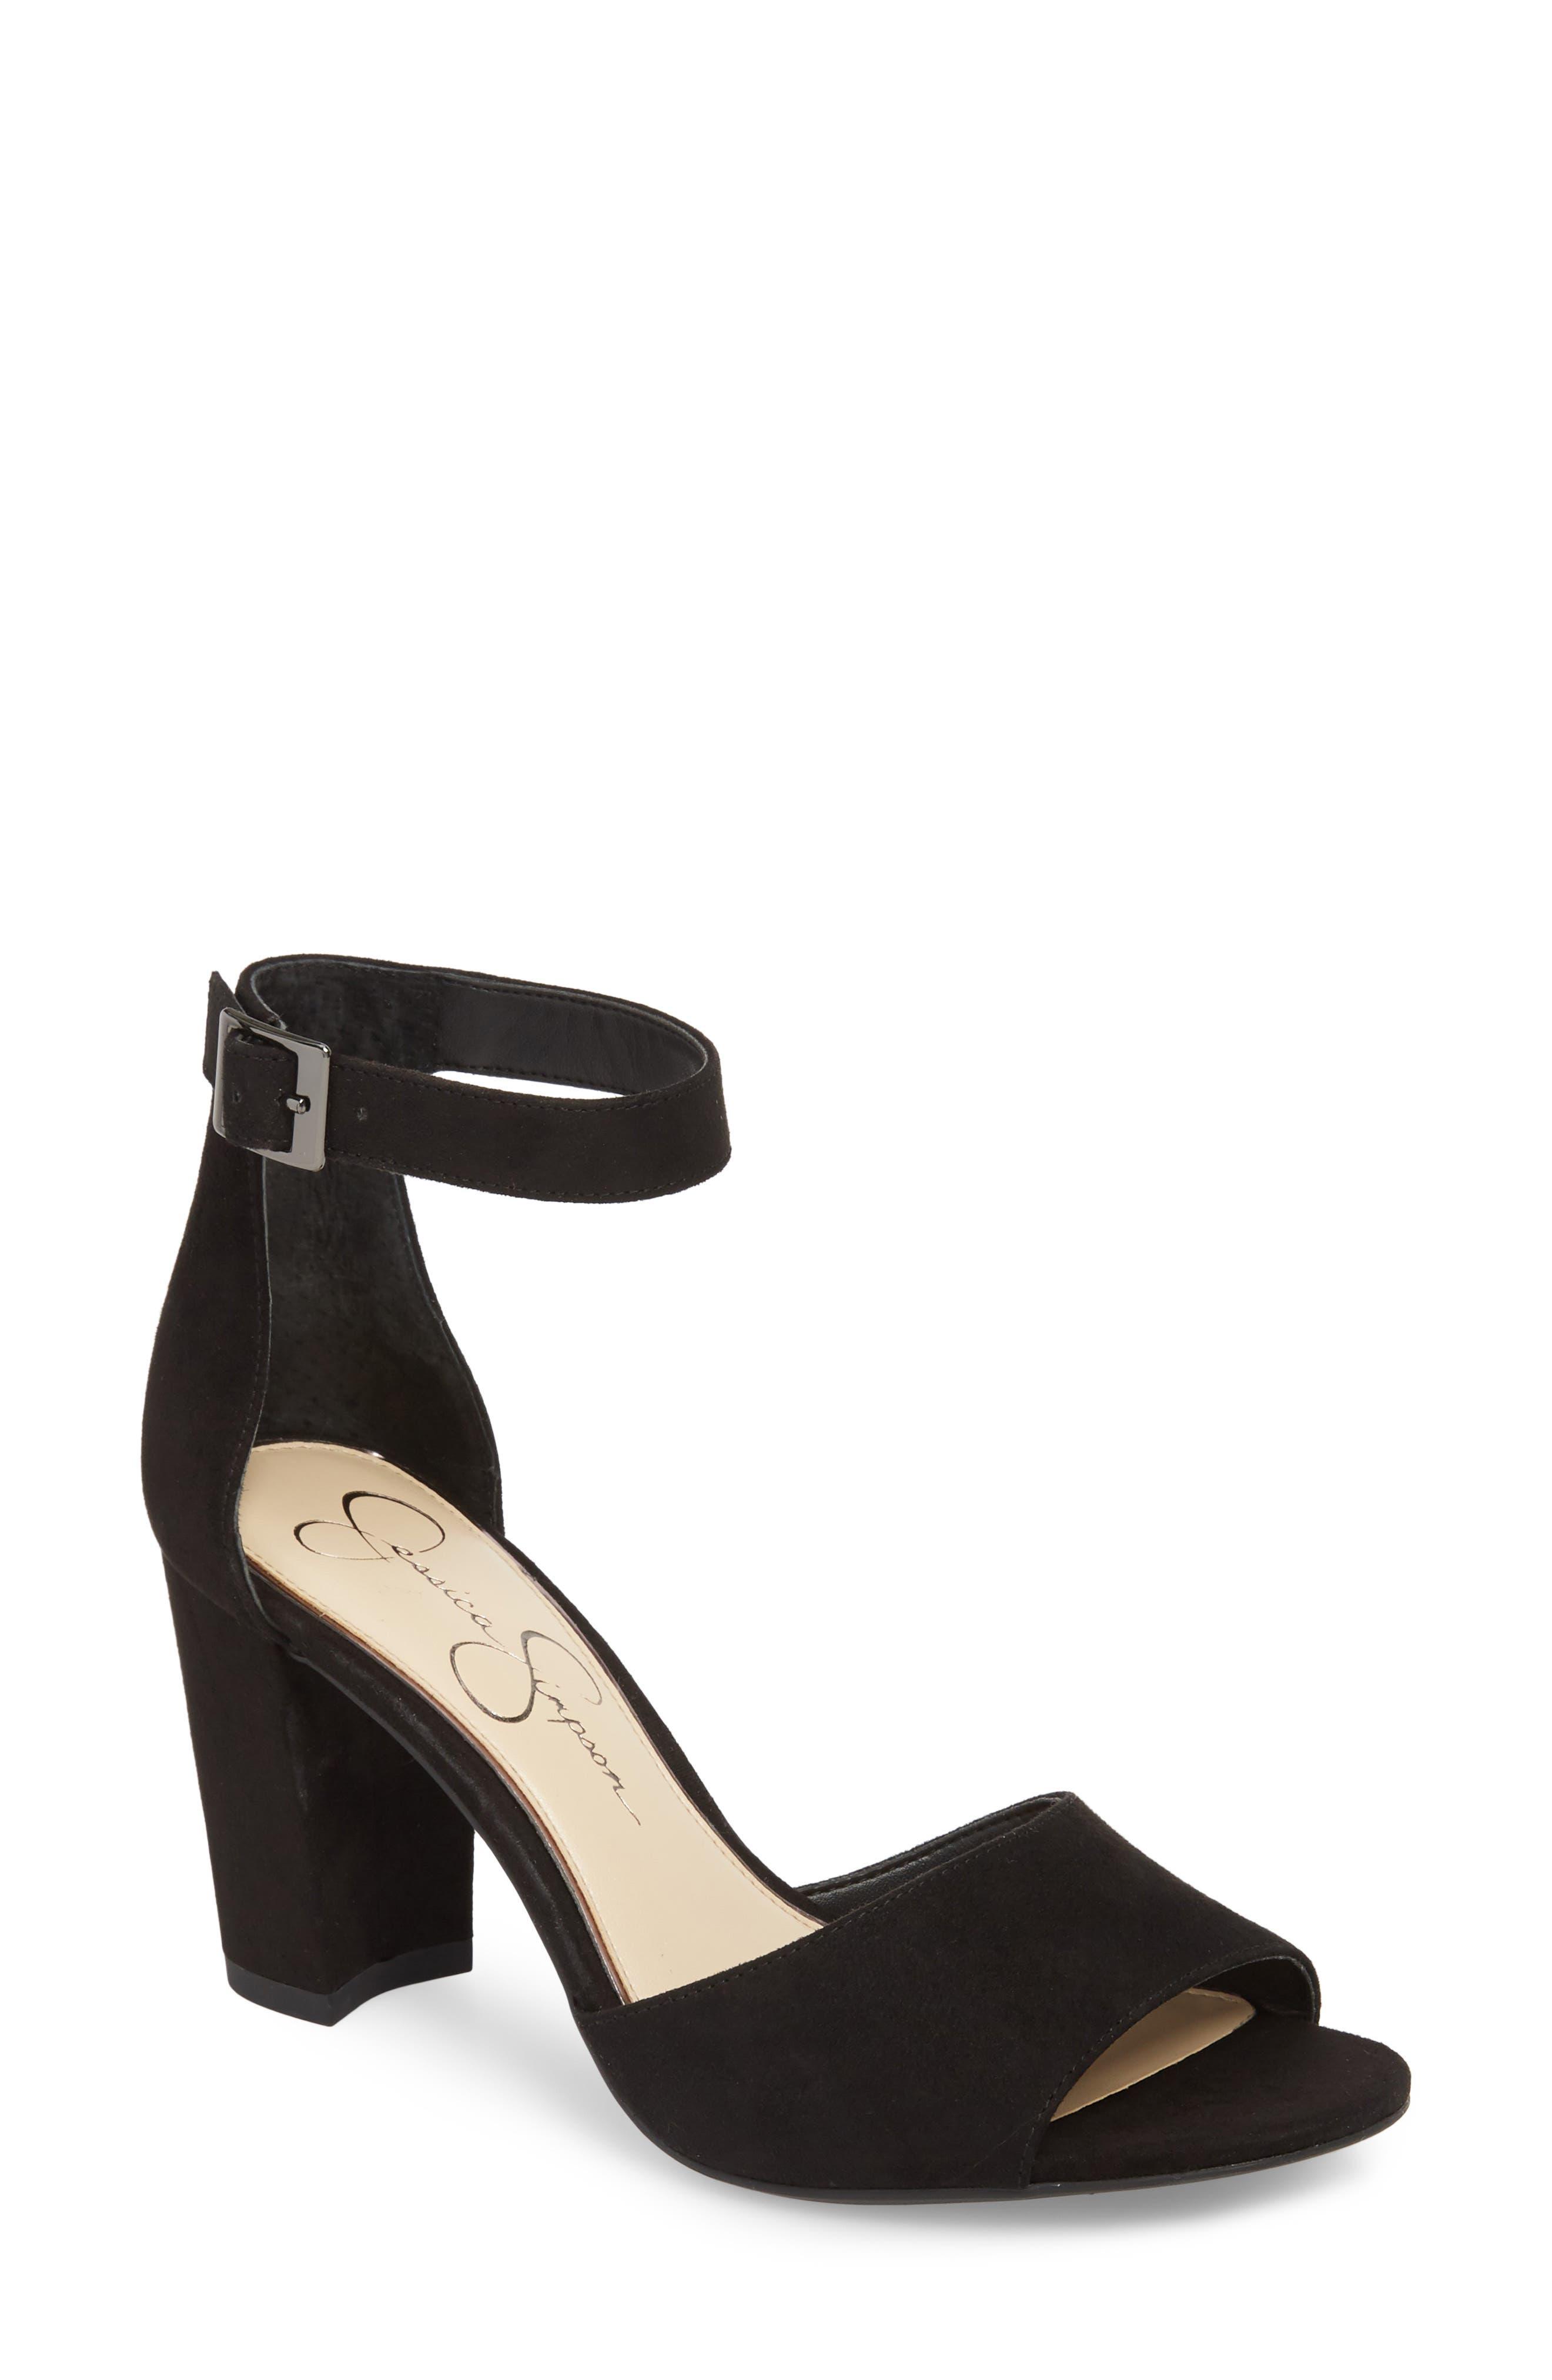 Sandals for Women On Sale, Black, Leather, 2017, 3 3.5 4 4.5 7.5 Alexander McQueen